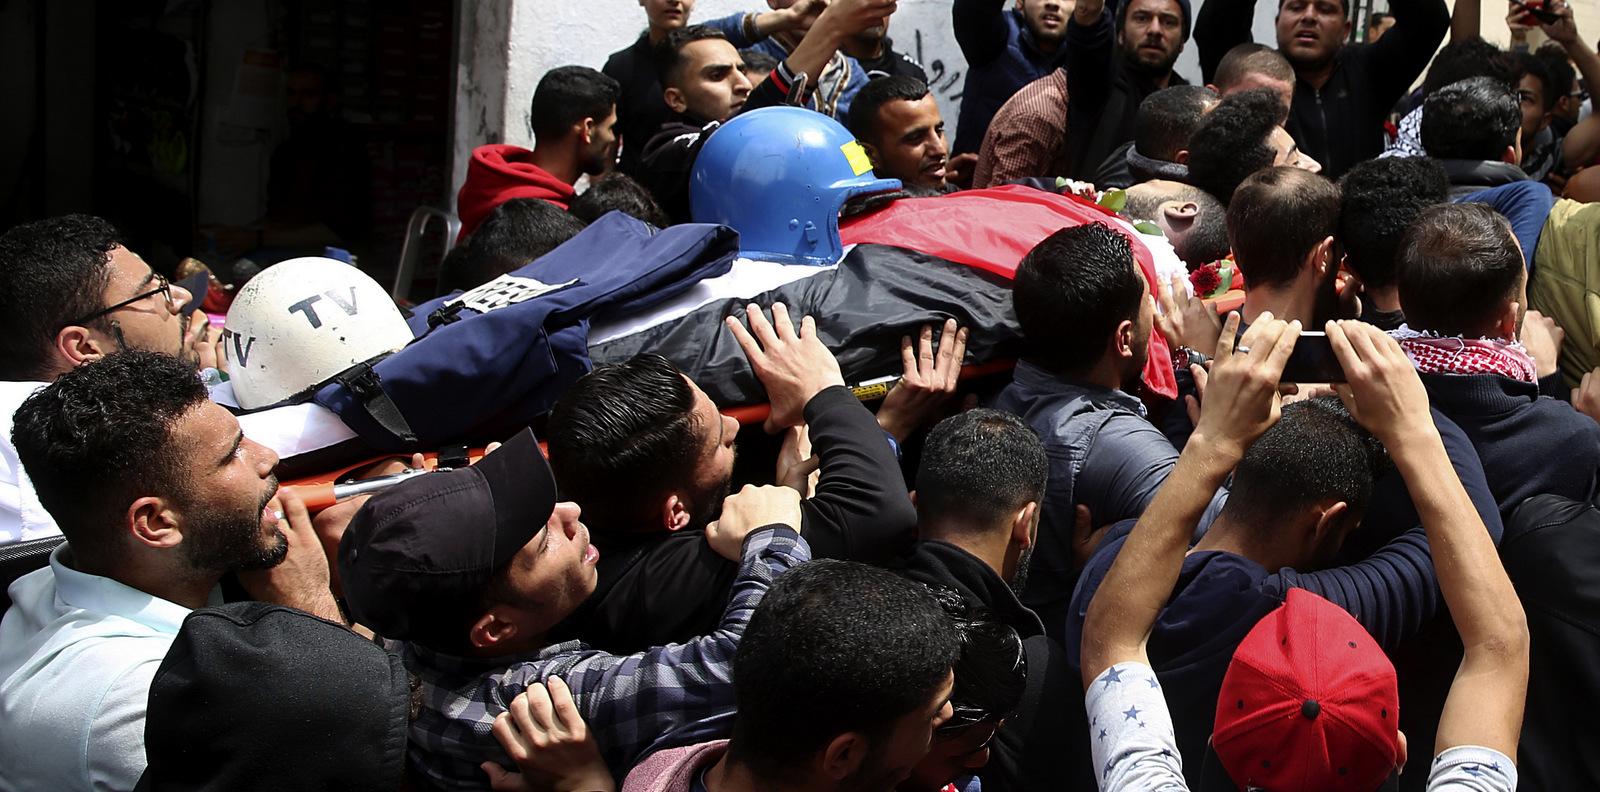 Gaza: Israeli Forces Kill Second Palestinian Journalist